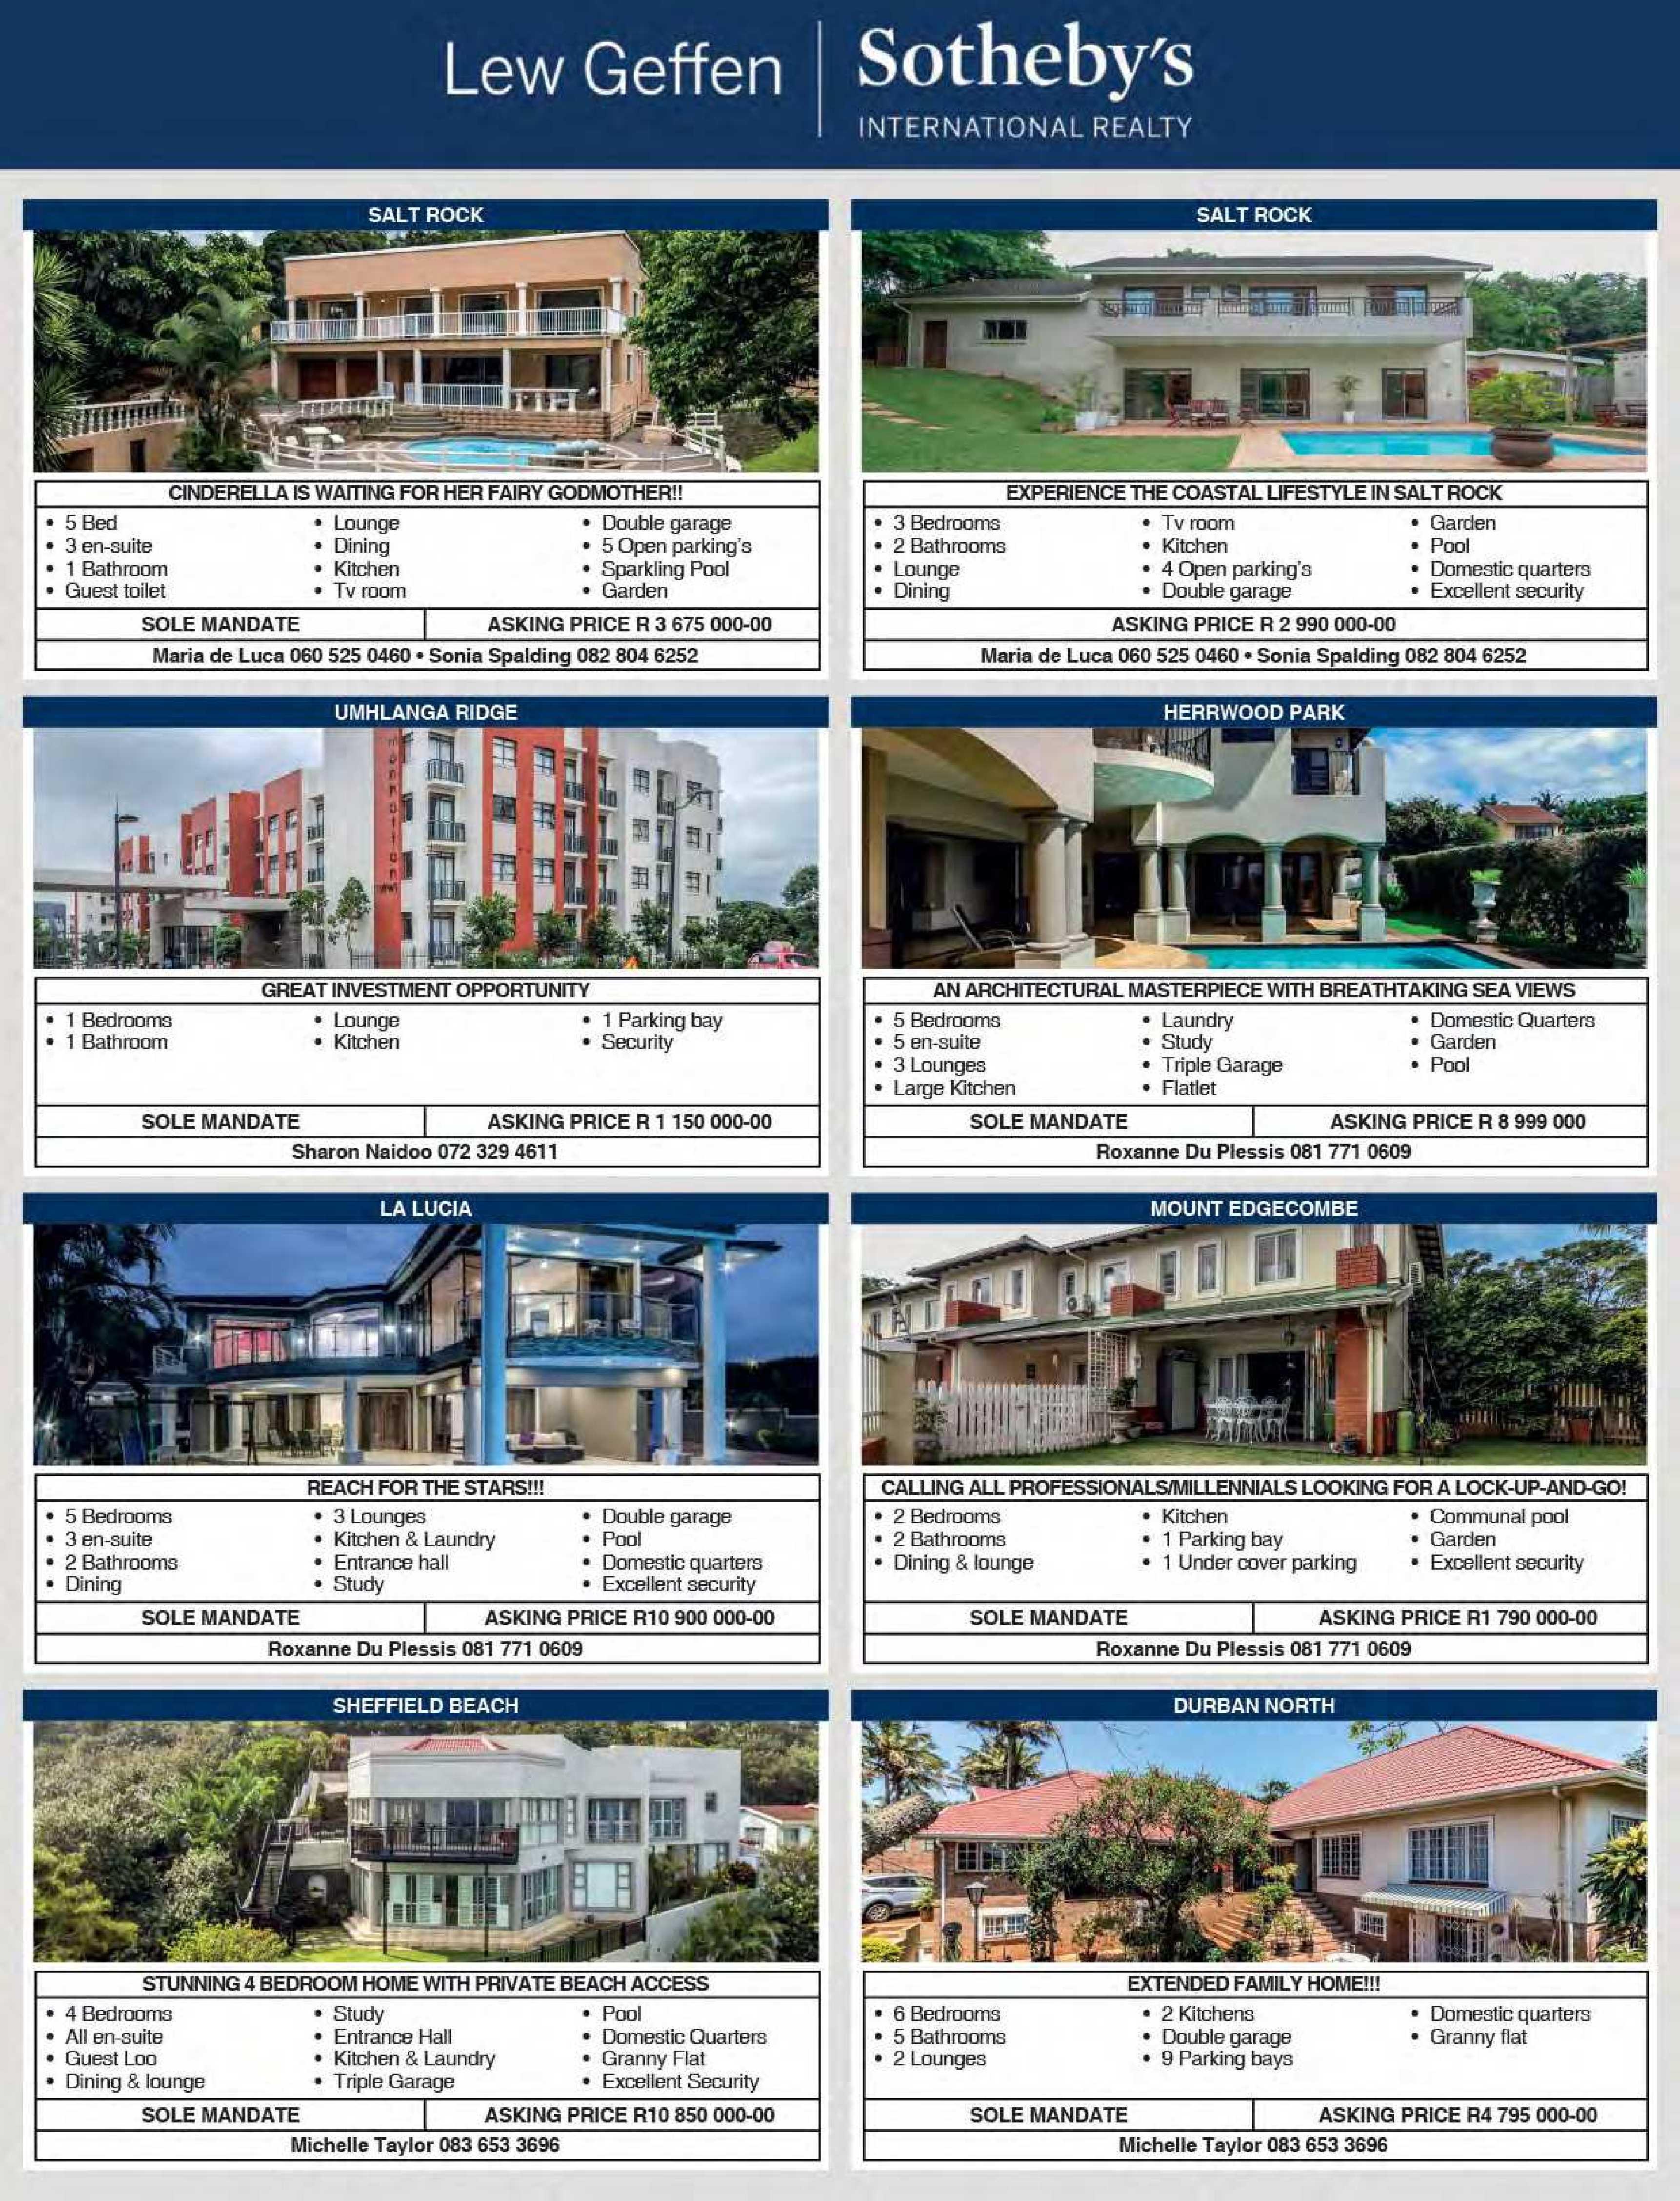 get-magazine-ballitoumhlanga-december-2017-january-2018-2-epapers-page-115